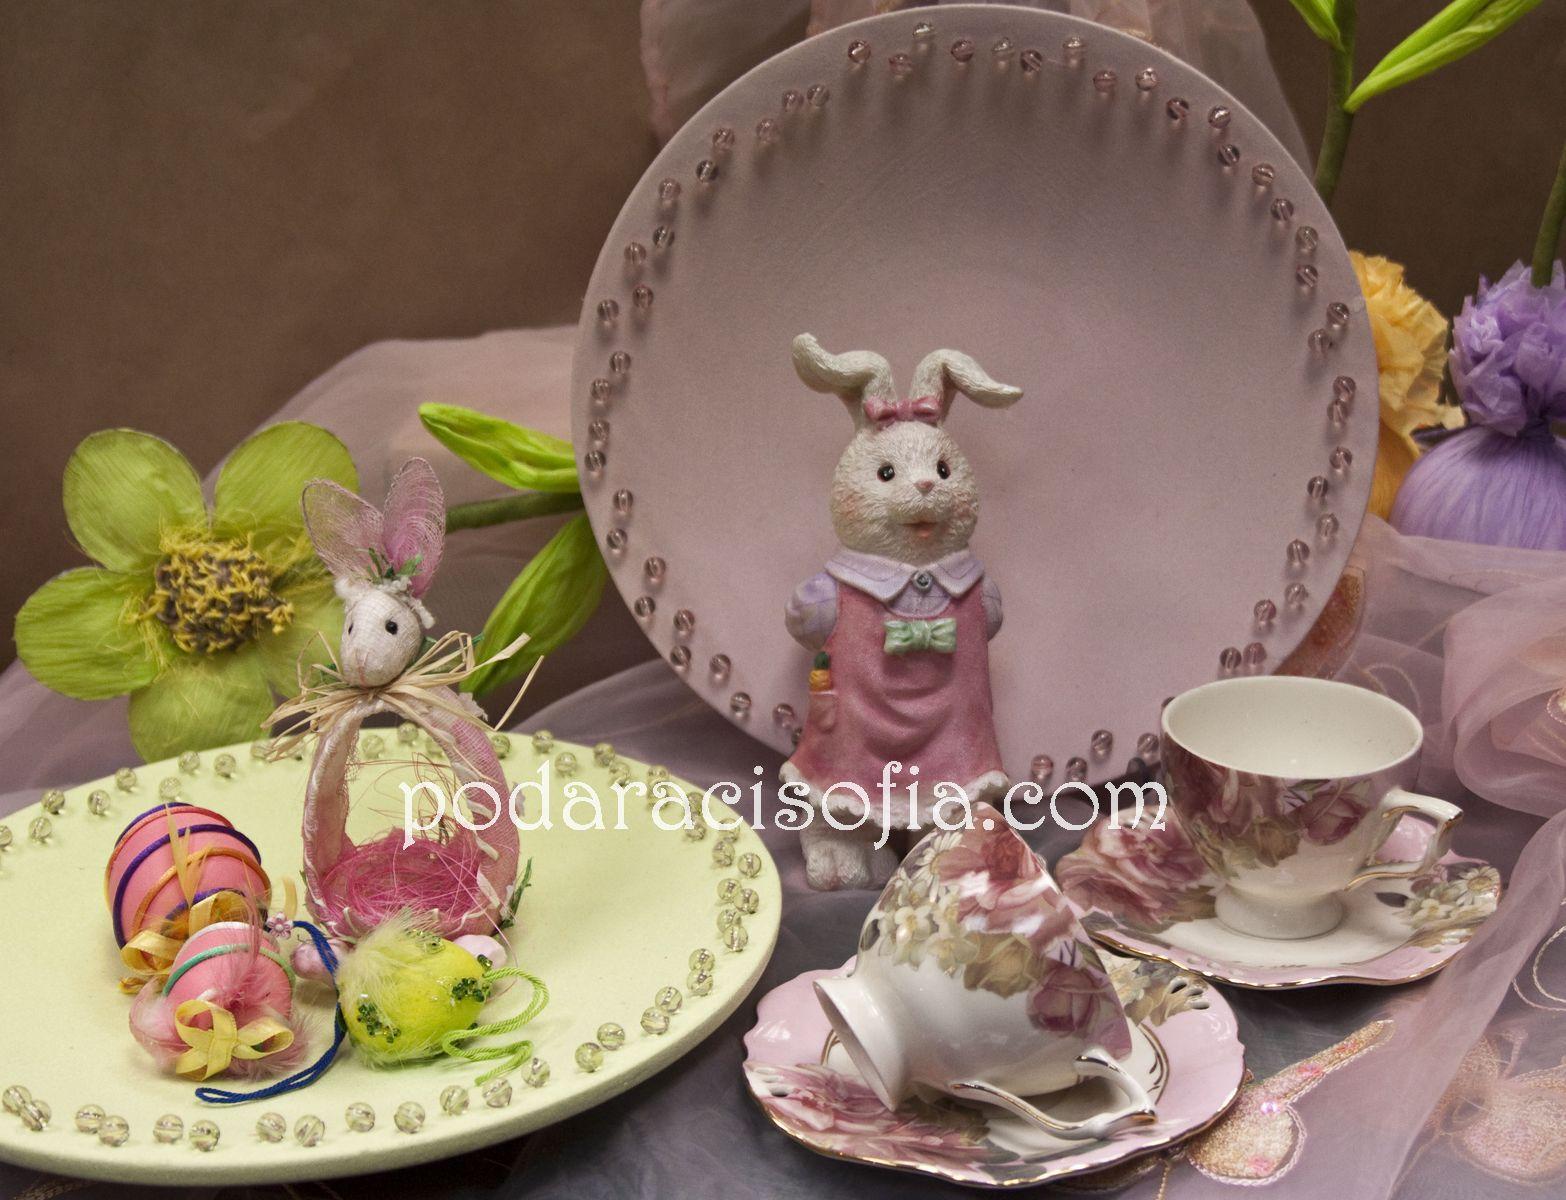 Великденски заек, фриктиери и поставки за яйце в розово, чашки за чай за Великден